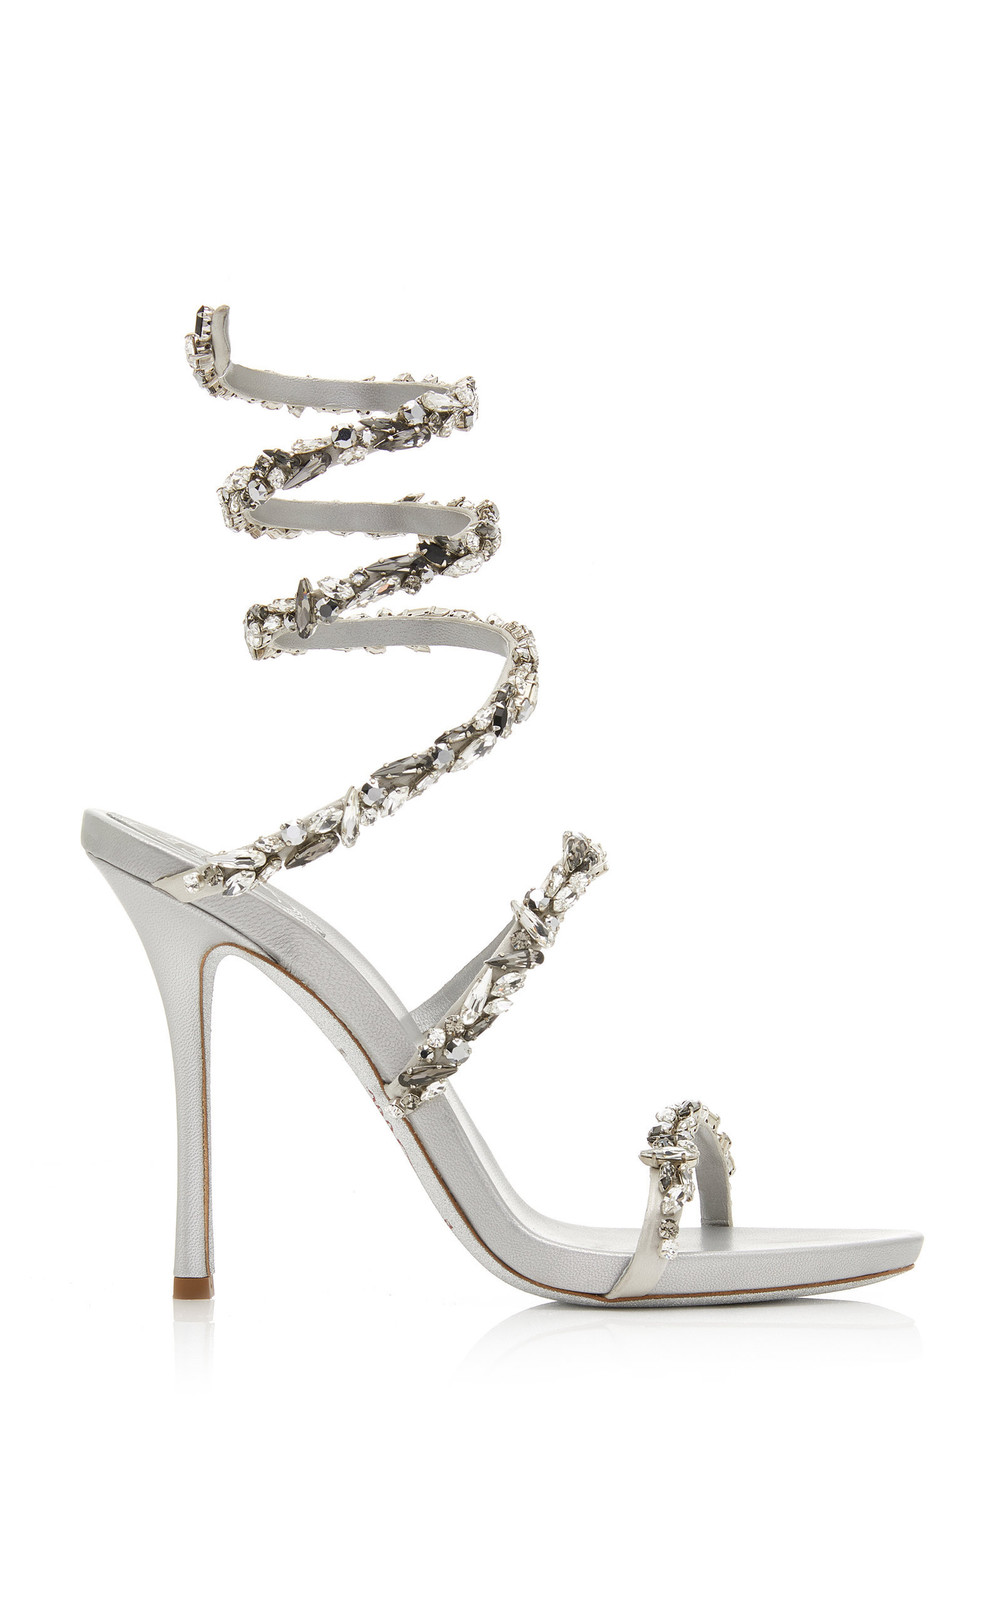 Rene Caovilla Crystal-Embellished Satin Snake-Coil Sandals in silver